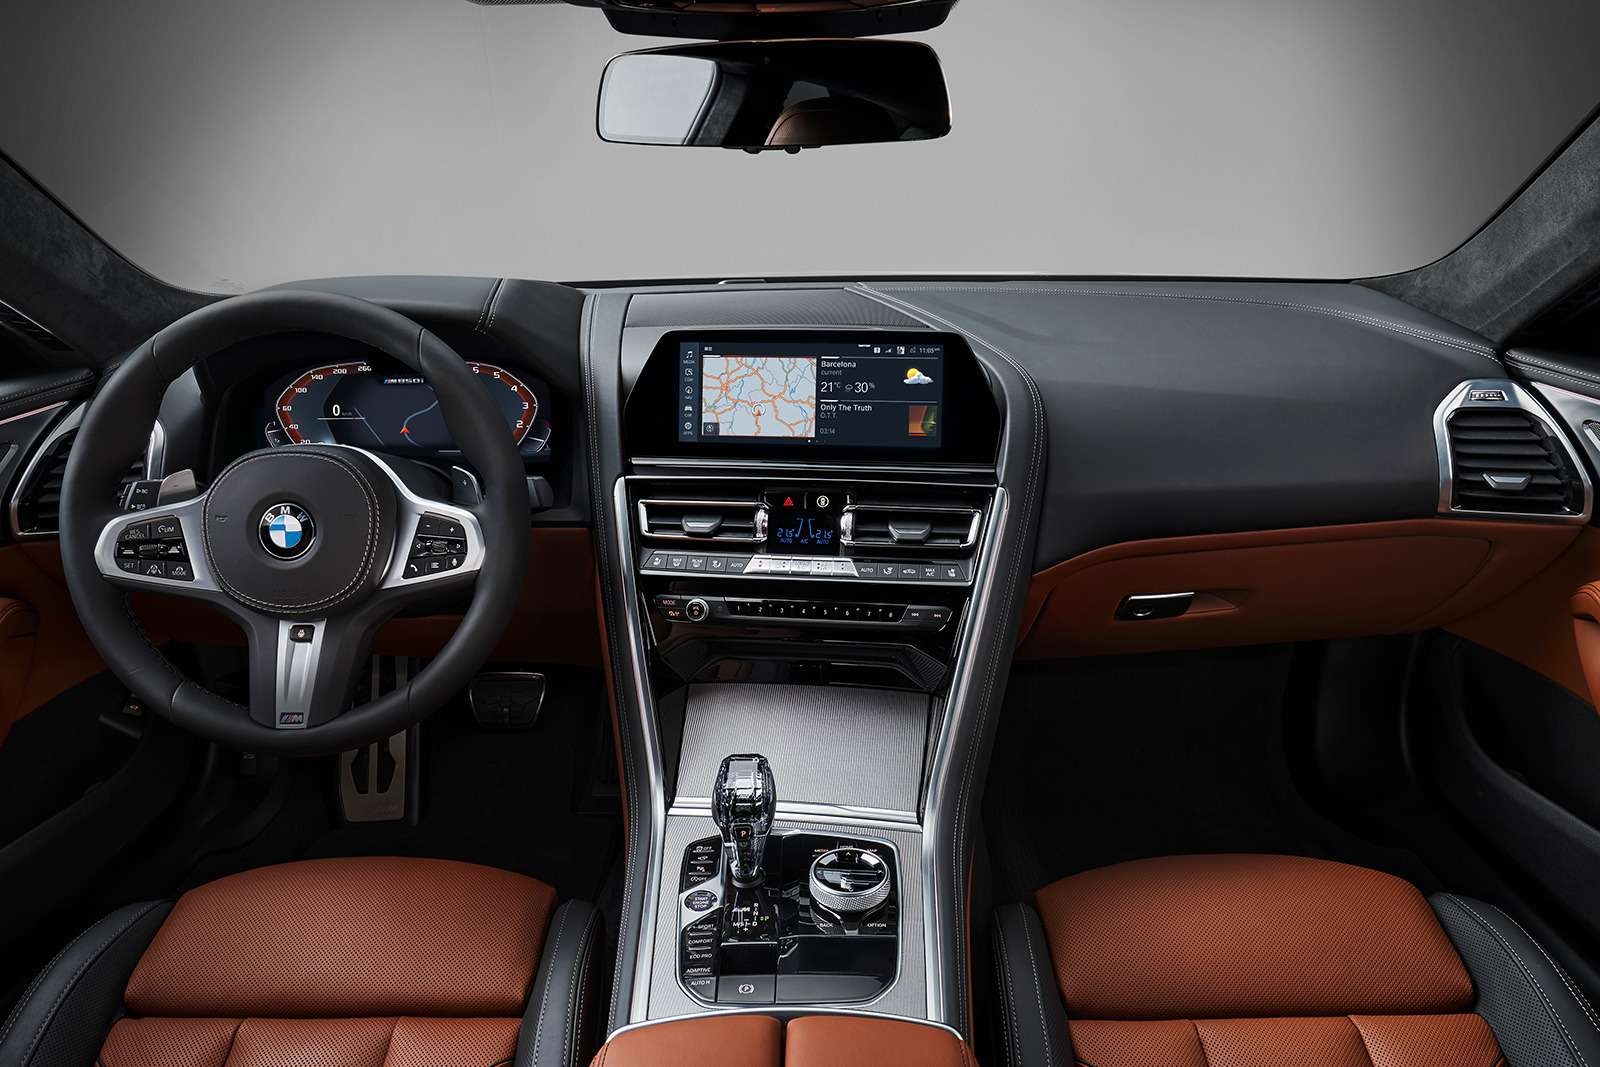 BMW8-й серии. 20лет спустя (почти)— фото 879672